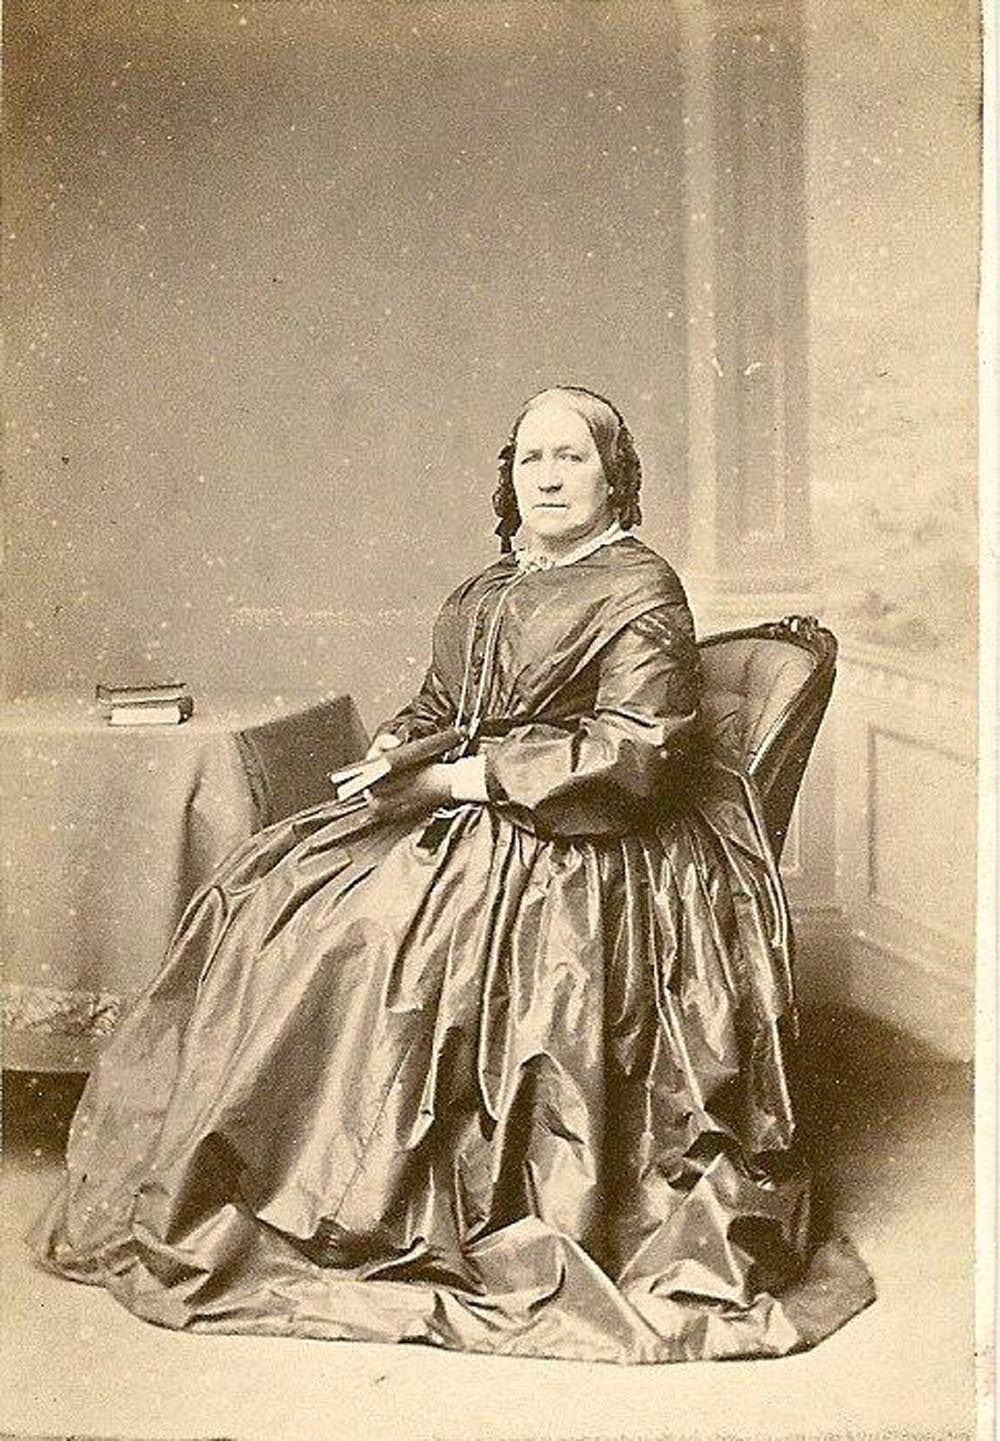 Esther_Bragg_Died_1871